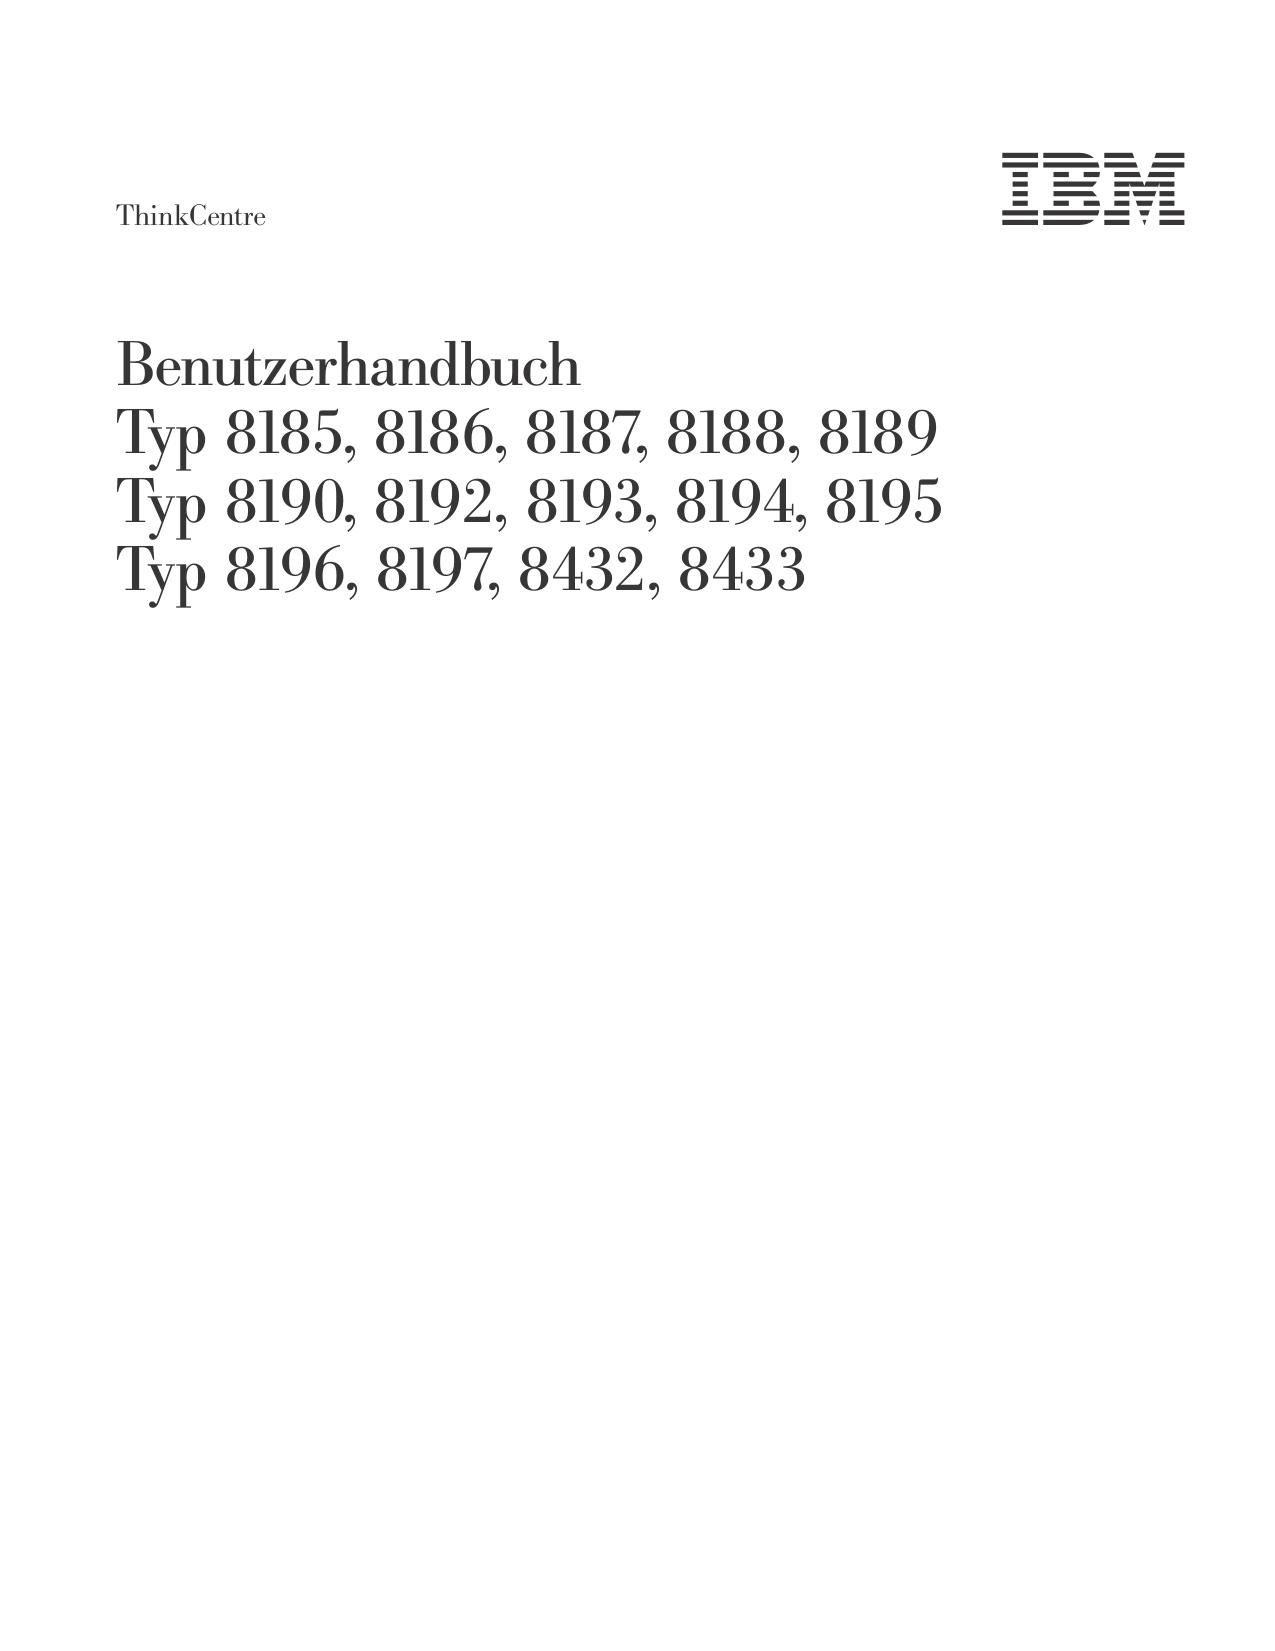 pdf for Lenovo Desktop ThinkCentre M50 8185 manual